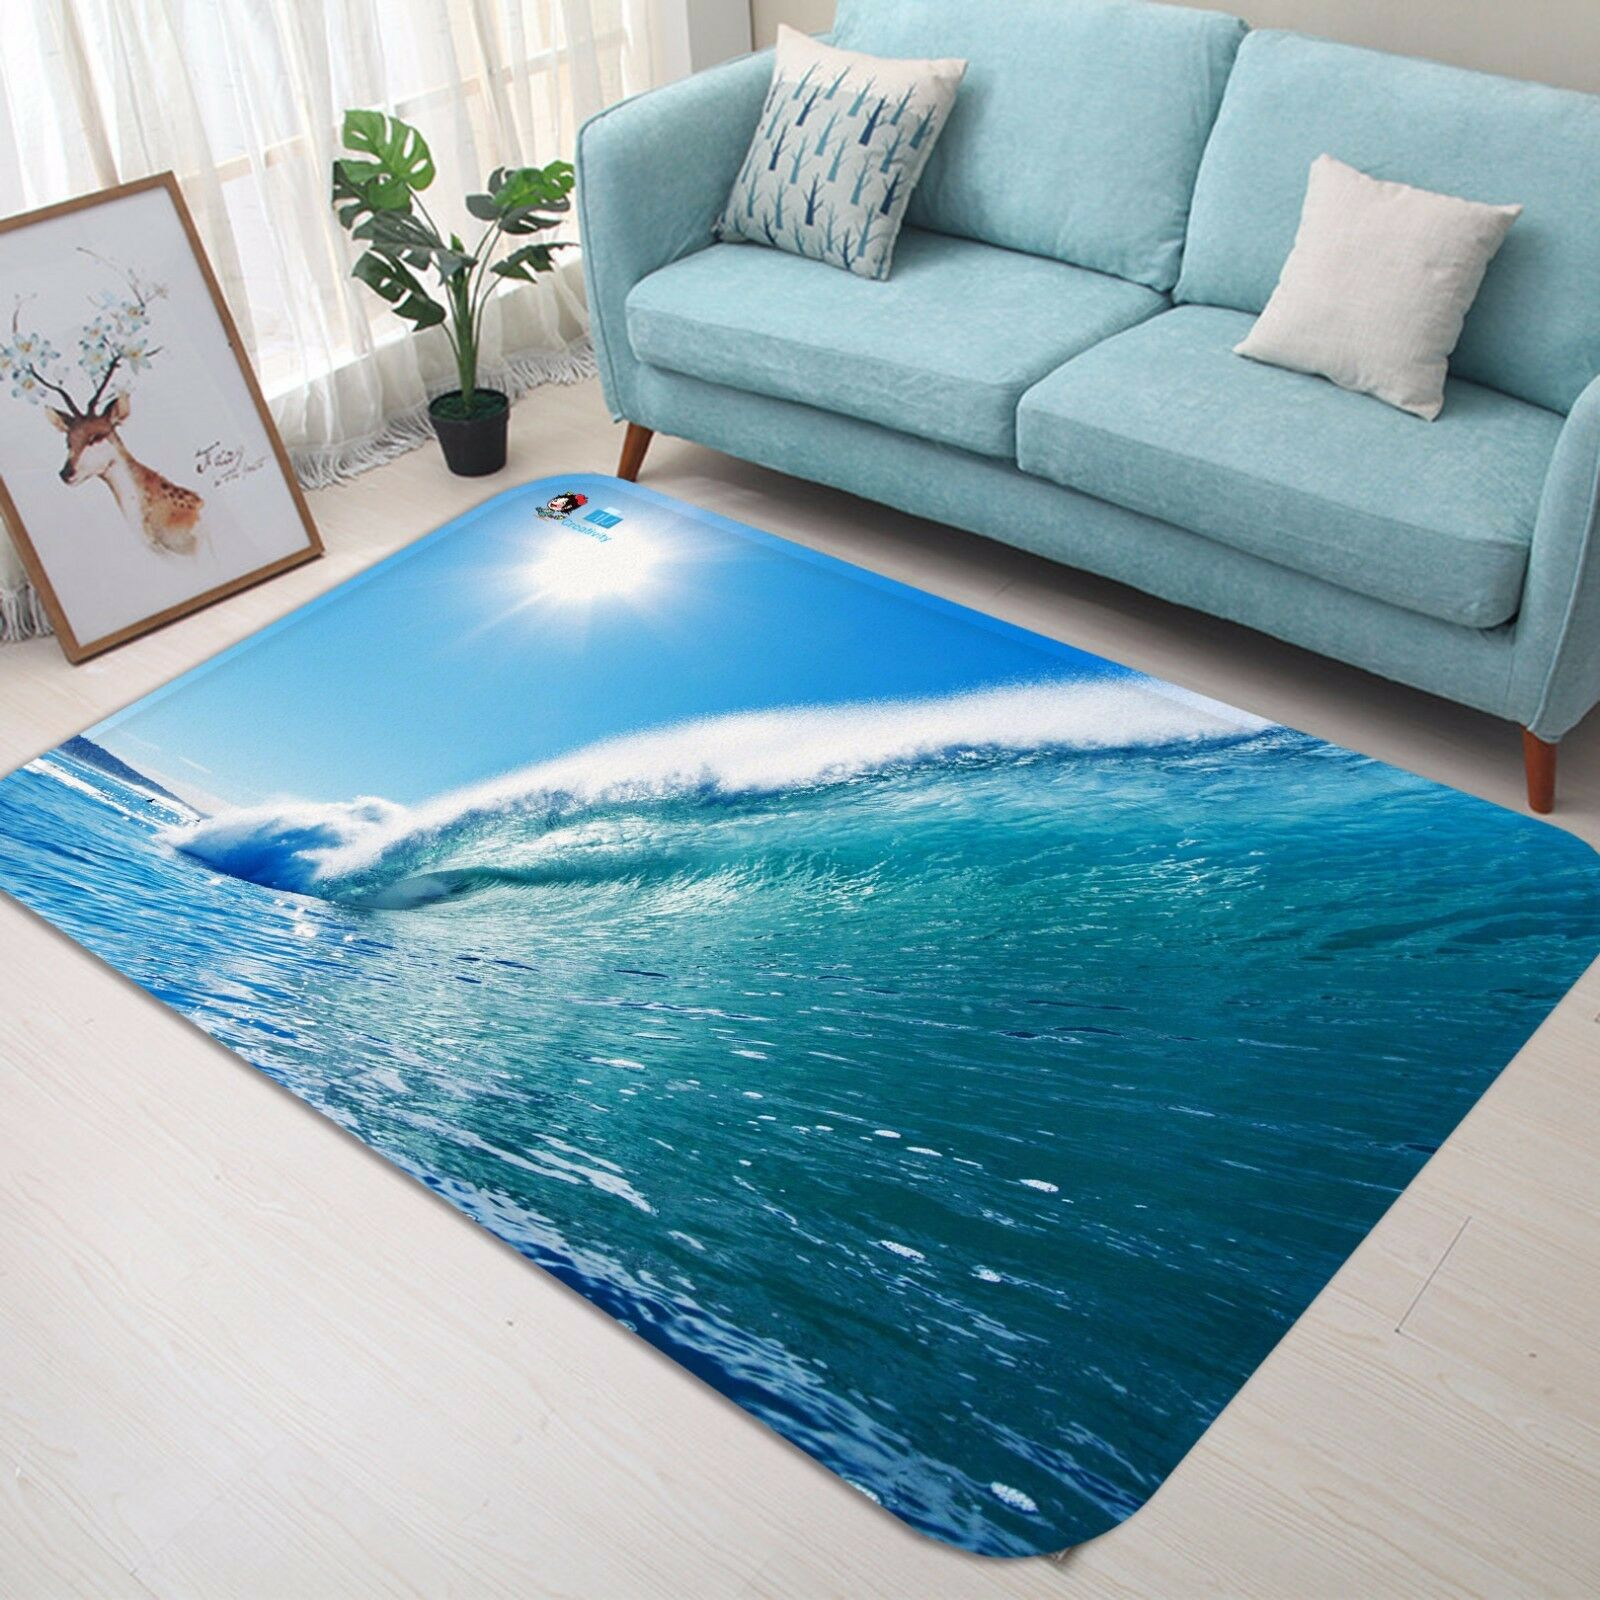 3D Wave Bule 50 Non Slip Rug Mat Mat Mat Room Mat Quality Elegant Photo Carpet US c5226c